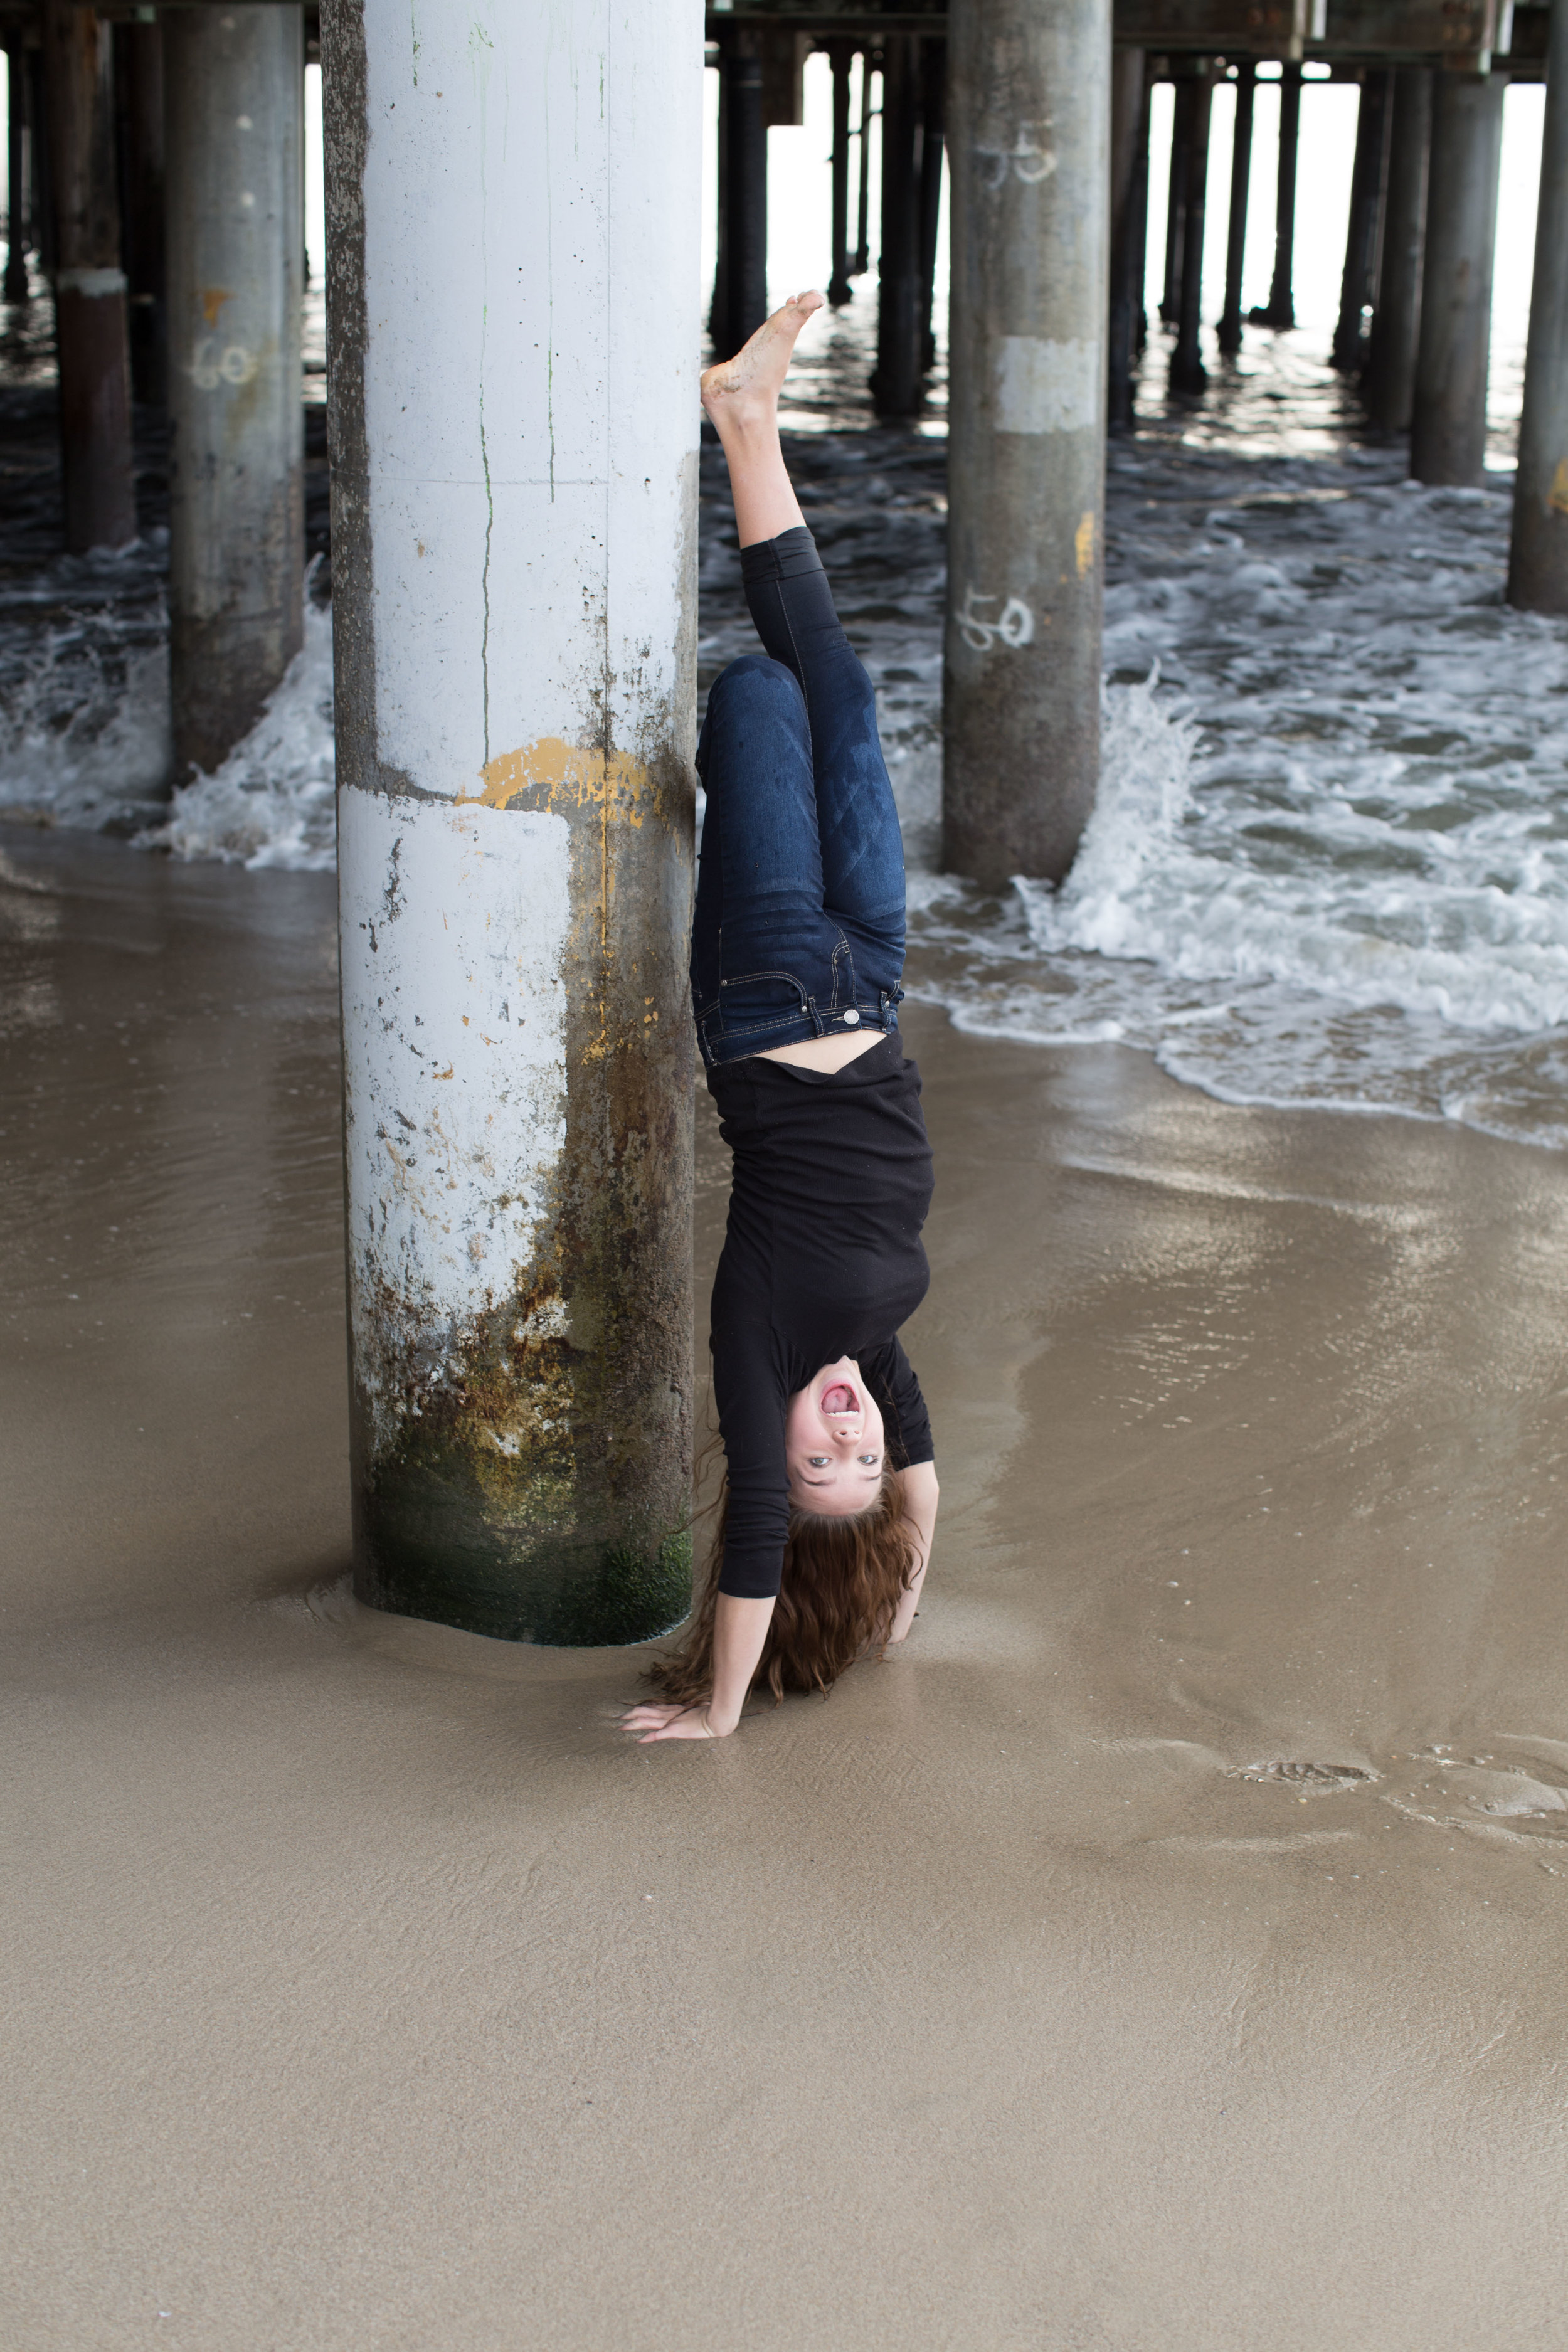 Chelsea Santa Monica Pier - 12.23.17 Selects (32 of 32).jpg